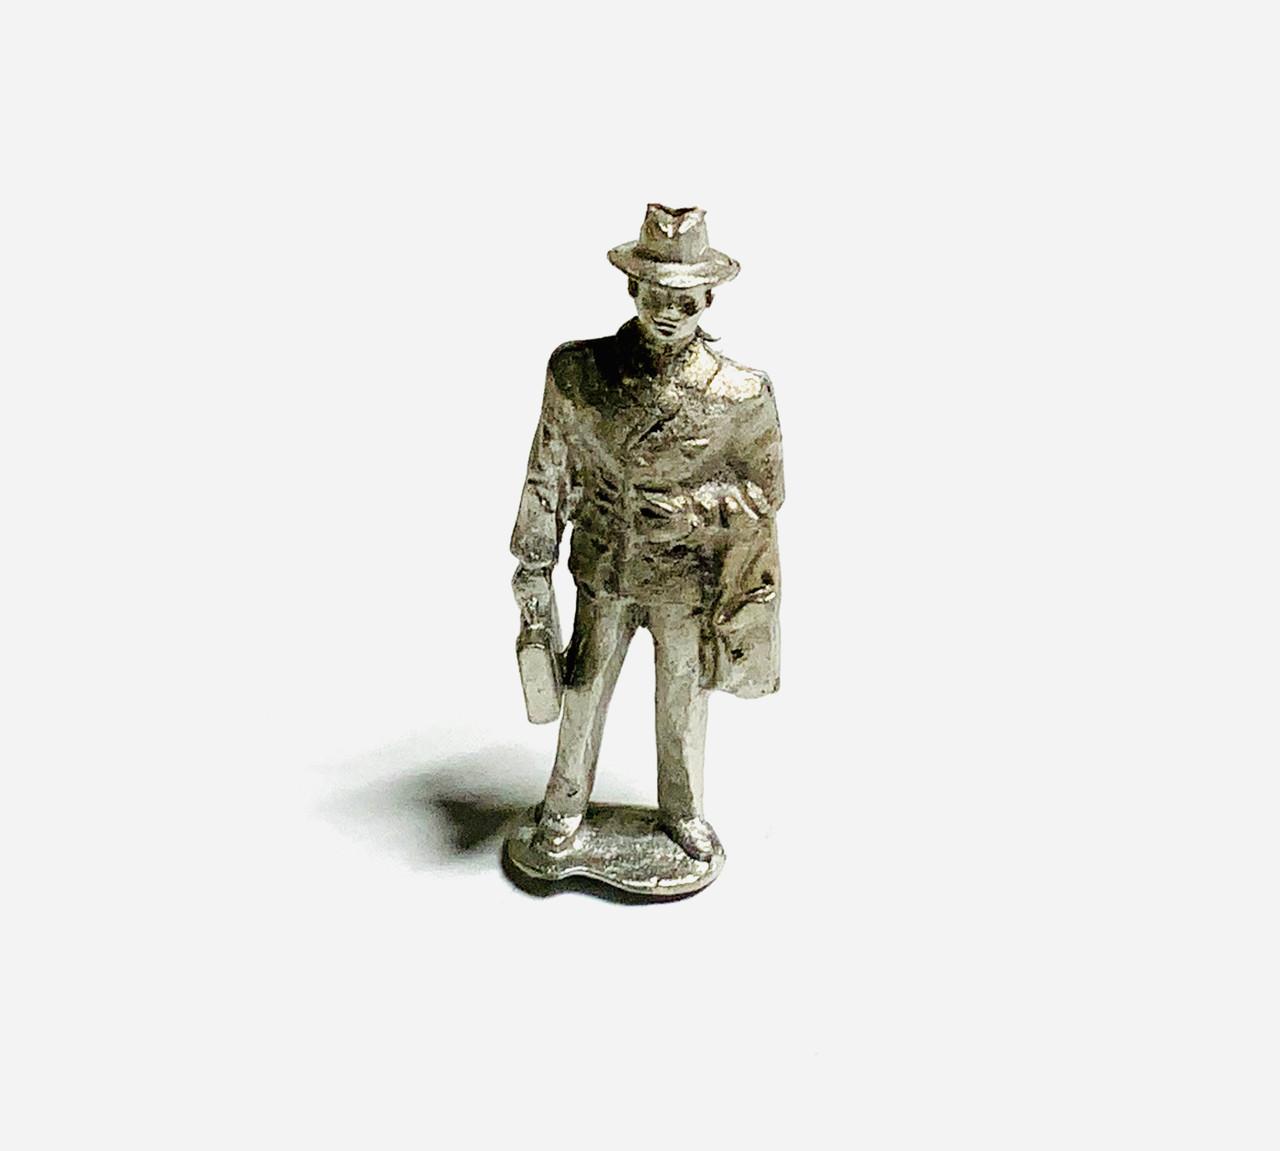 48-1263 Man with Briefcase Suitcase Figure FKA Keil Line O scale